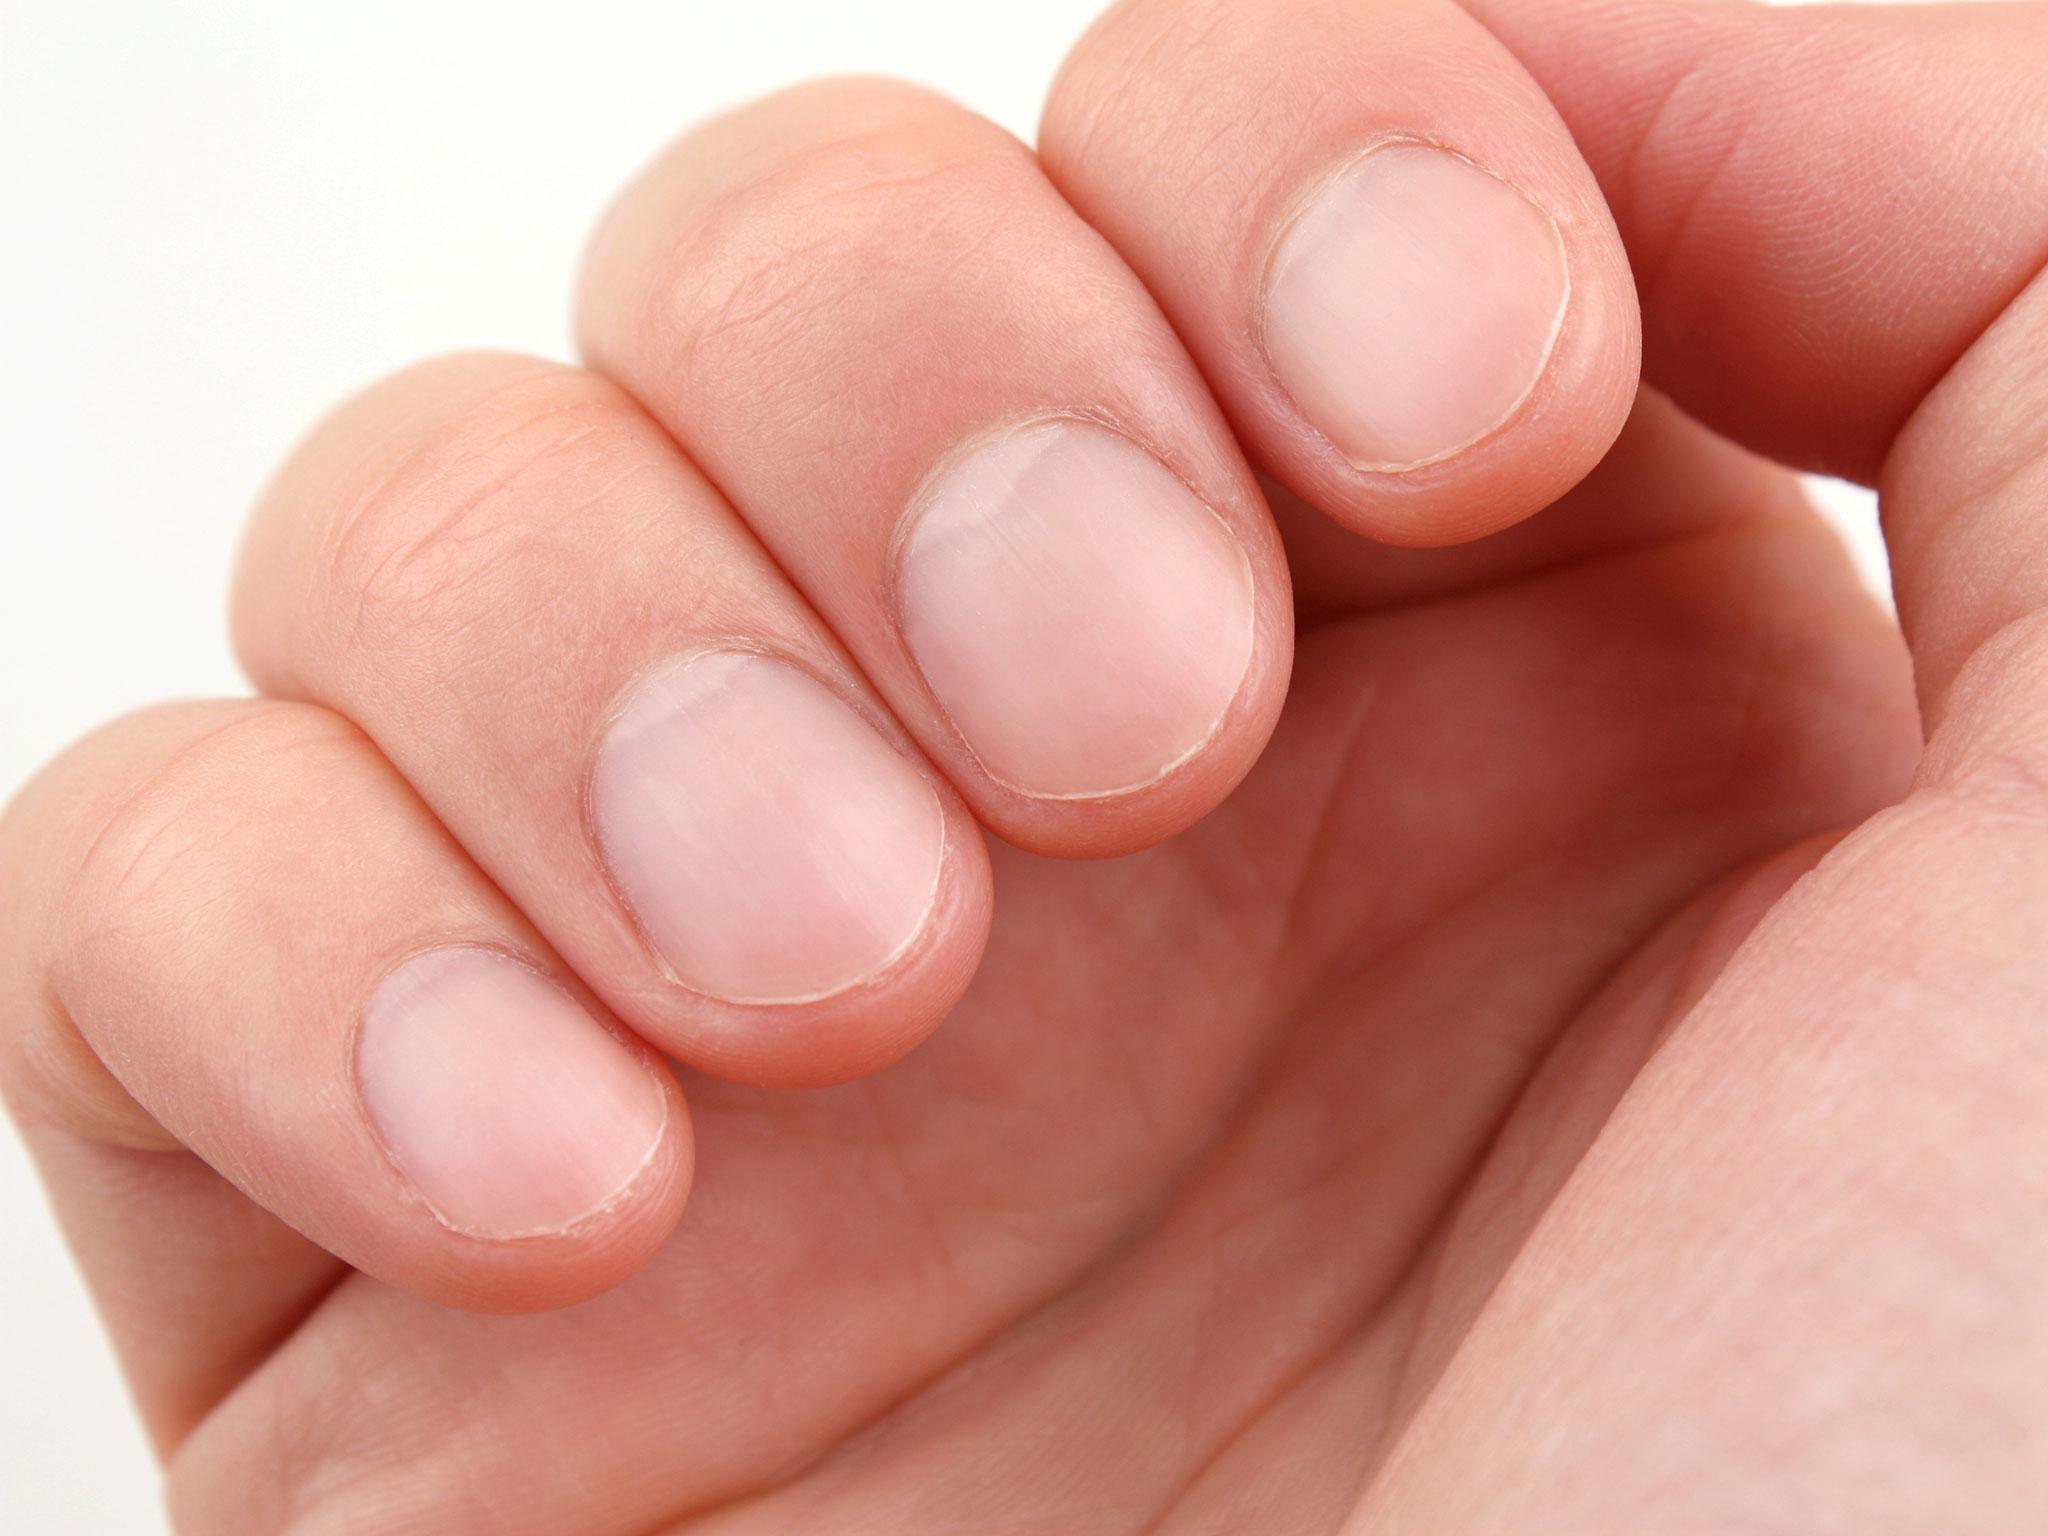 School bans pupils from growing fingernails longer than 1.5cm under ...